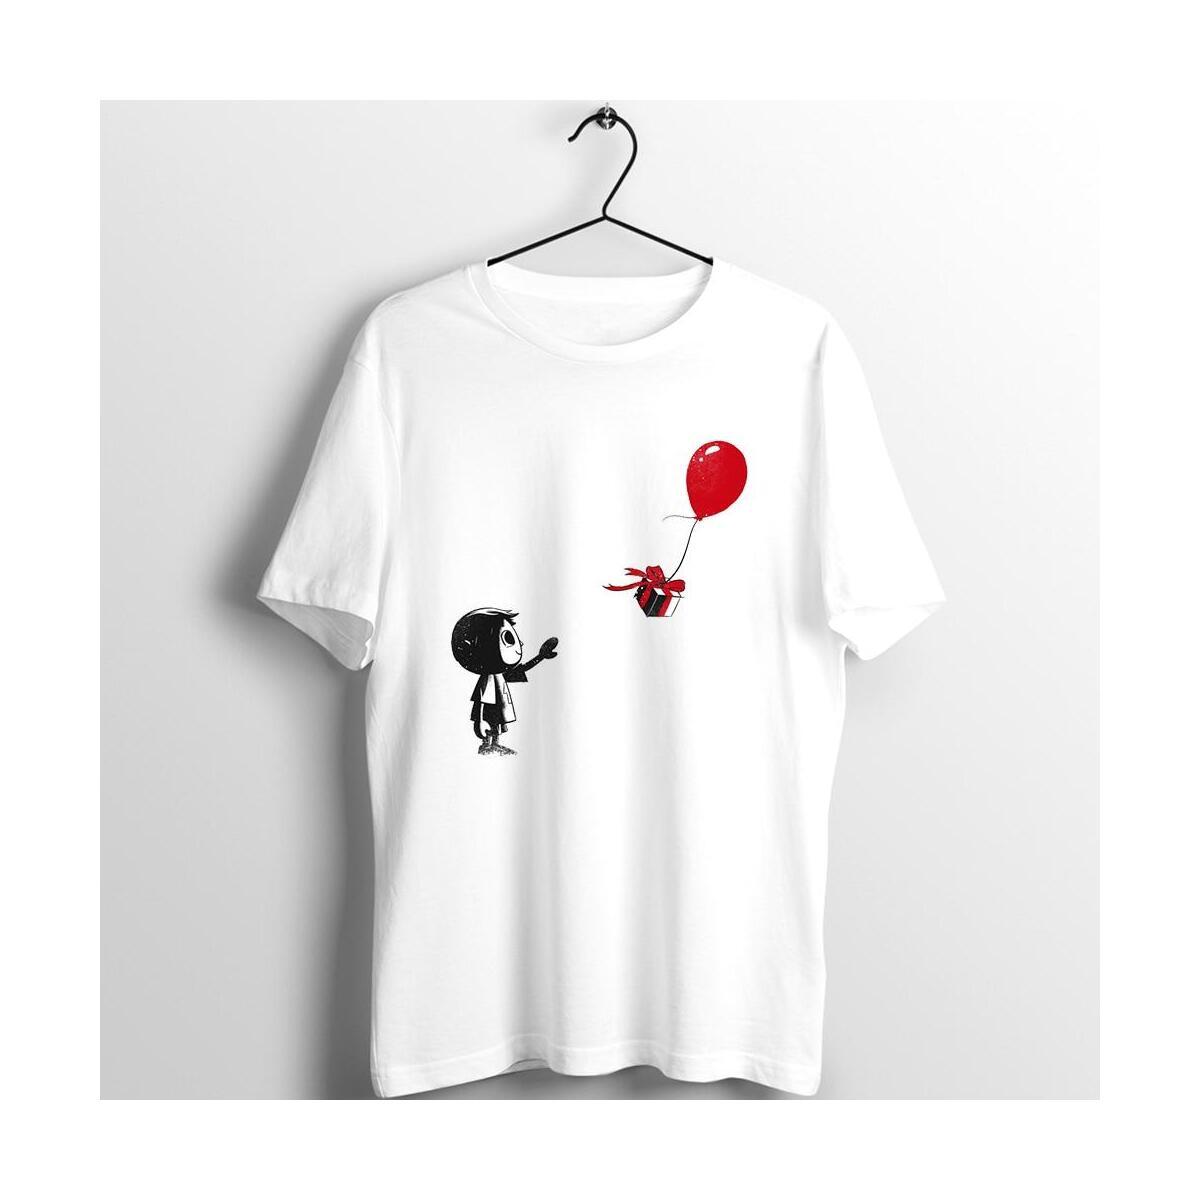 Villager with a Balloon Shirt, Villager with Balloon / XXXL